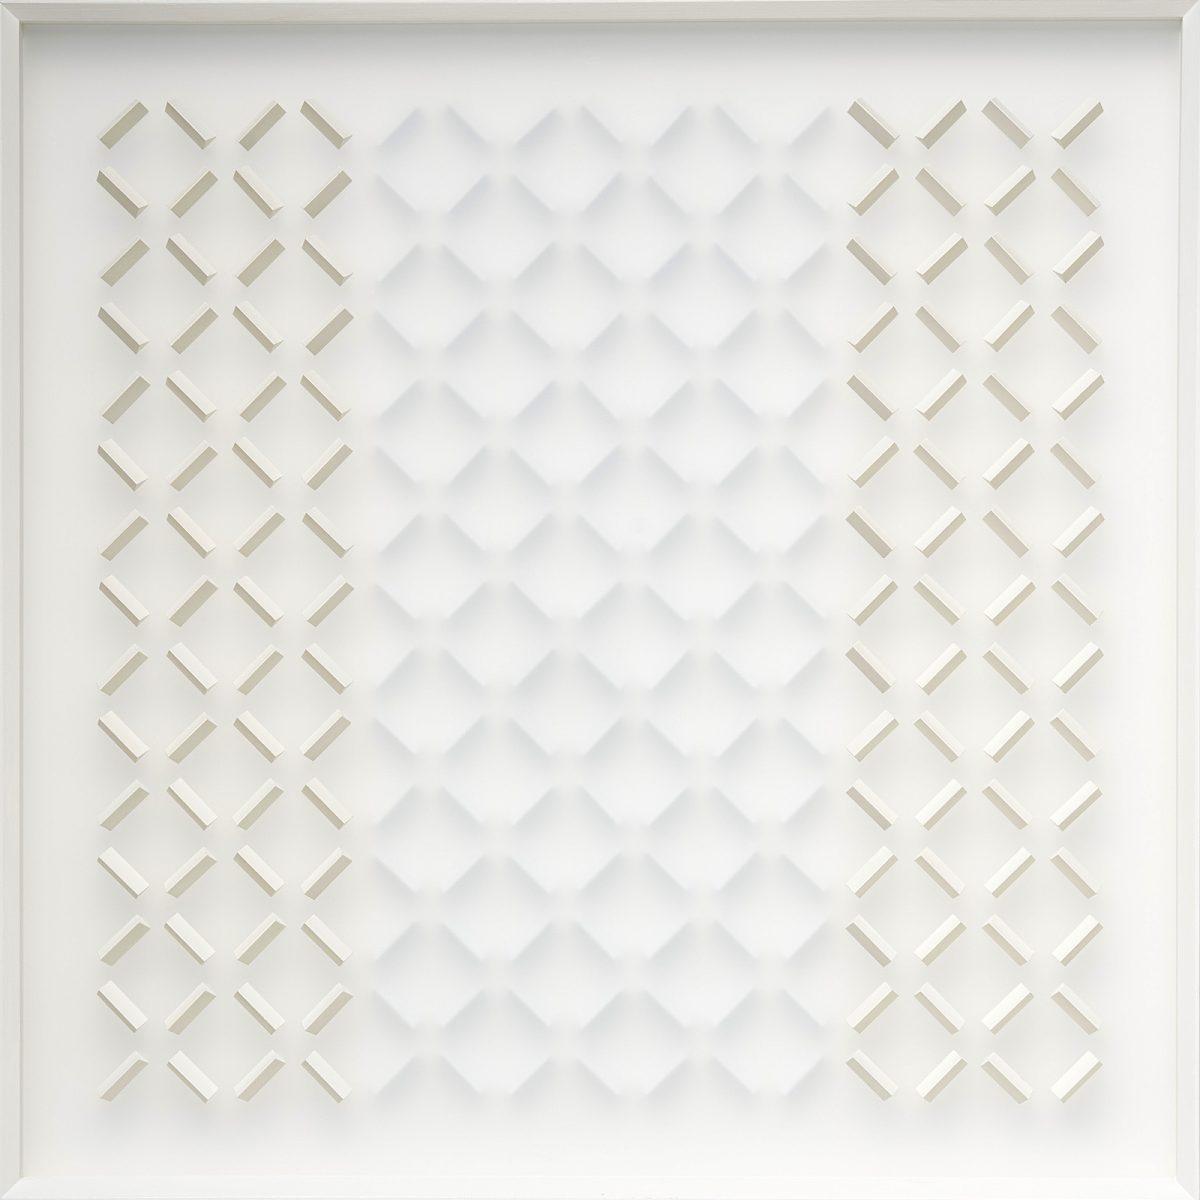 03 Klaus Staudt, induktives Gelb, 2018, 70 x 70 x 6,5cm, Holz, Acrylfarbe, Plexiglas; Foto: Norbert Miguletz